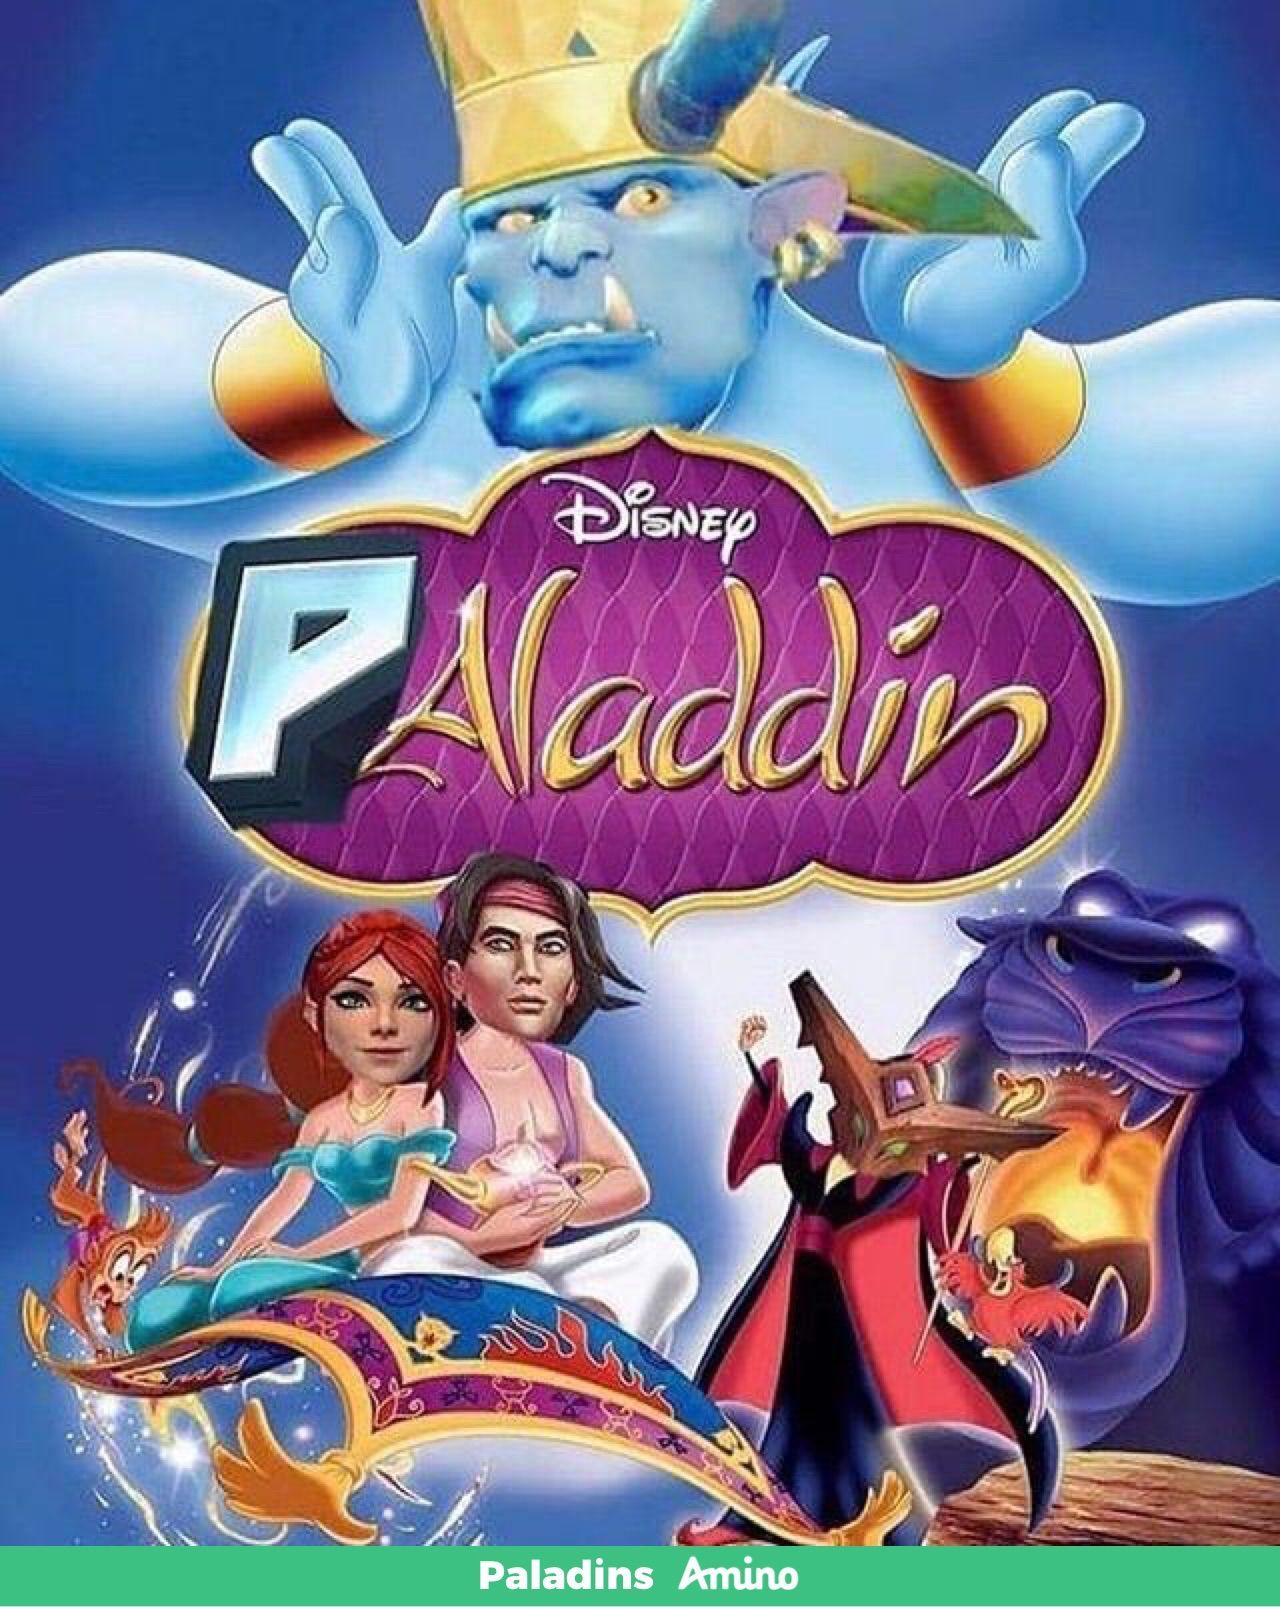 Pin De Gatordragon En Anime Peliculas Infantiles De Disney Peliculas De Disney Pelicula Aladdin